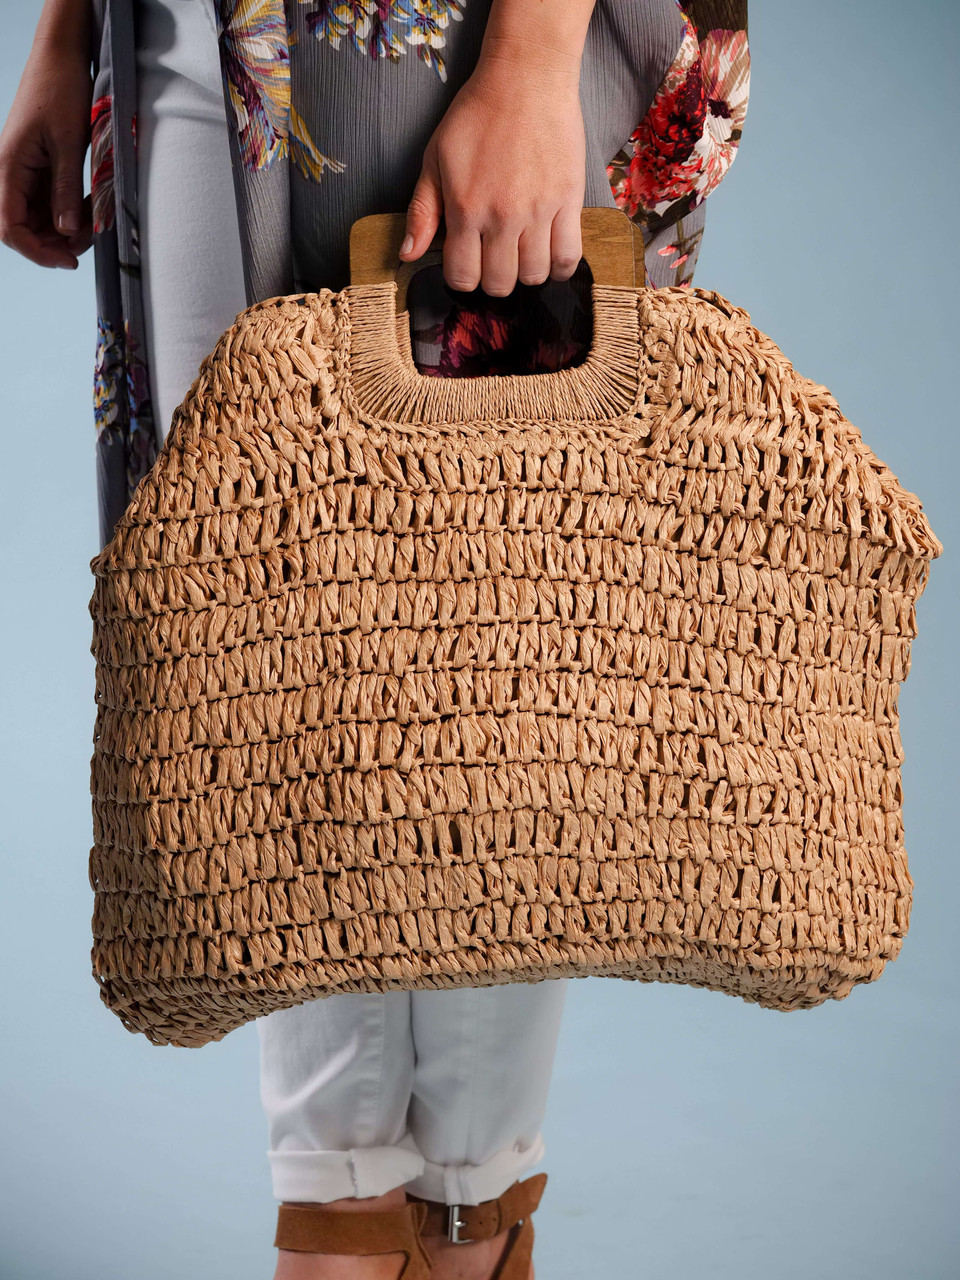 straw bag wood handles